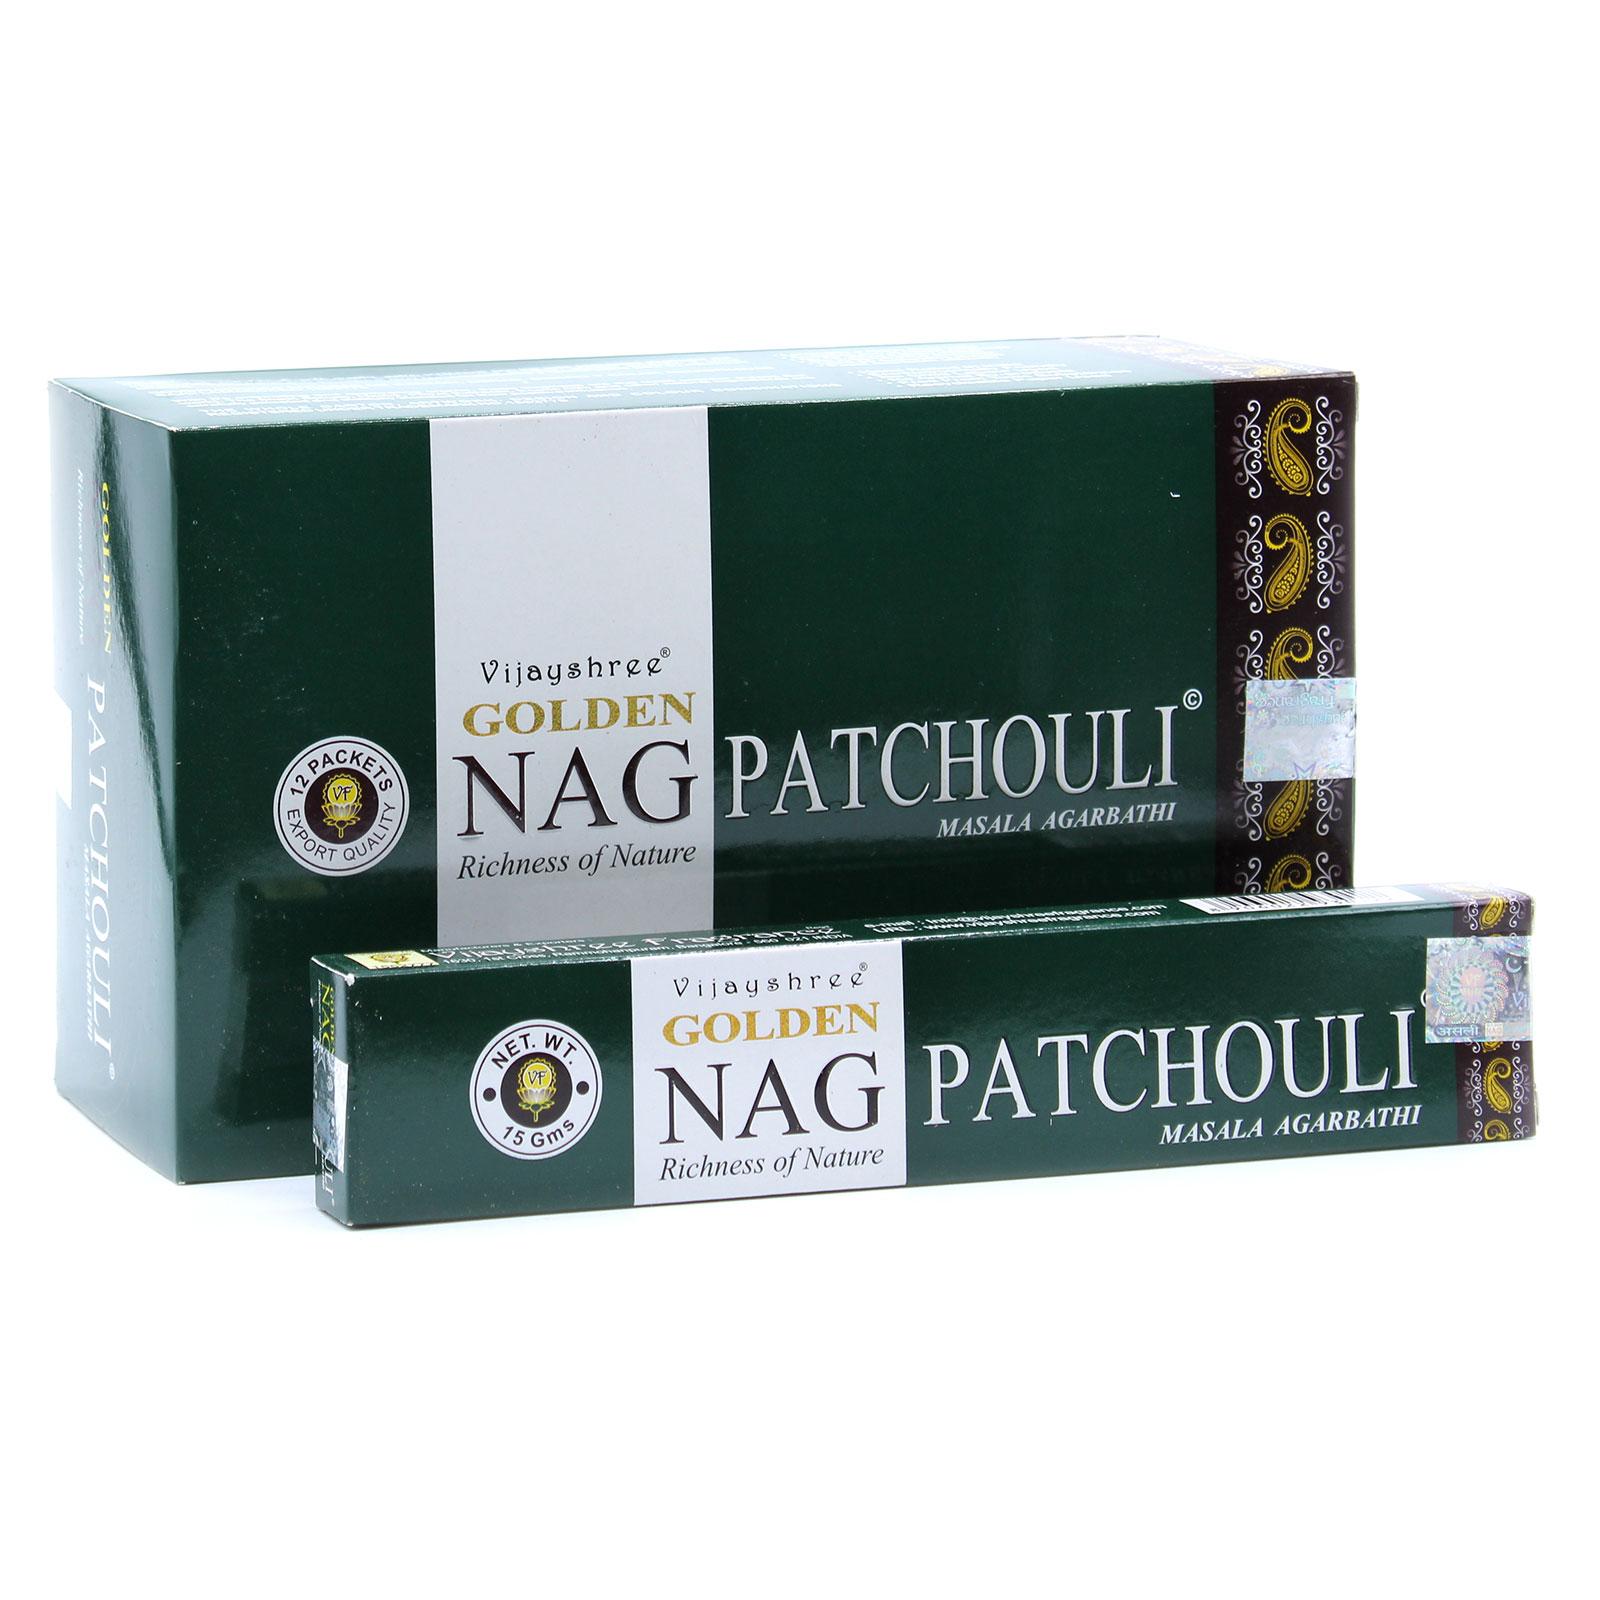 15g Golden Nag Pathouli Incense